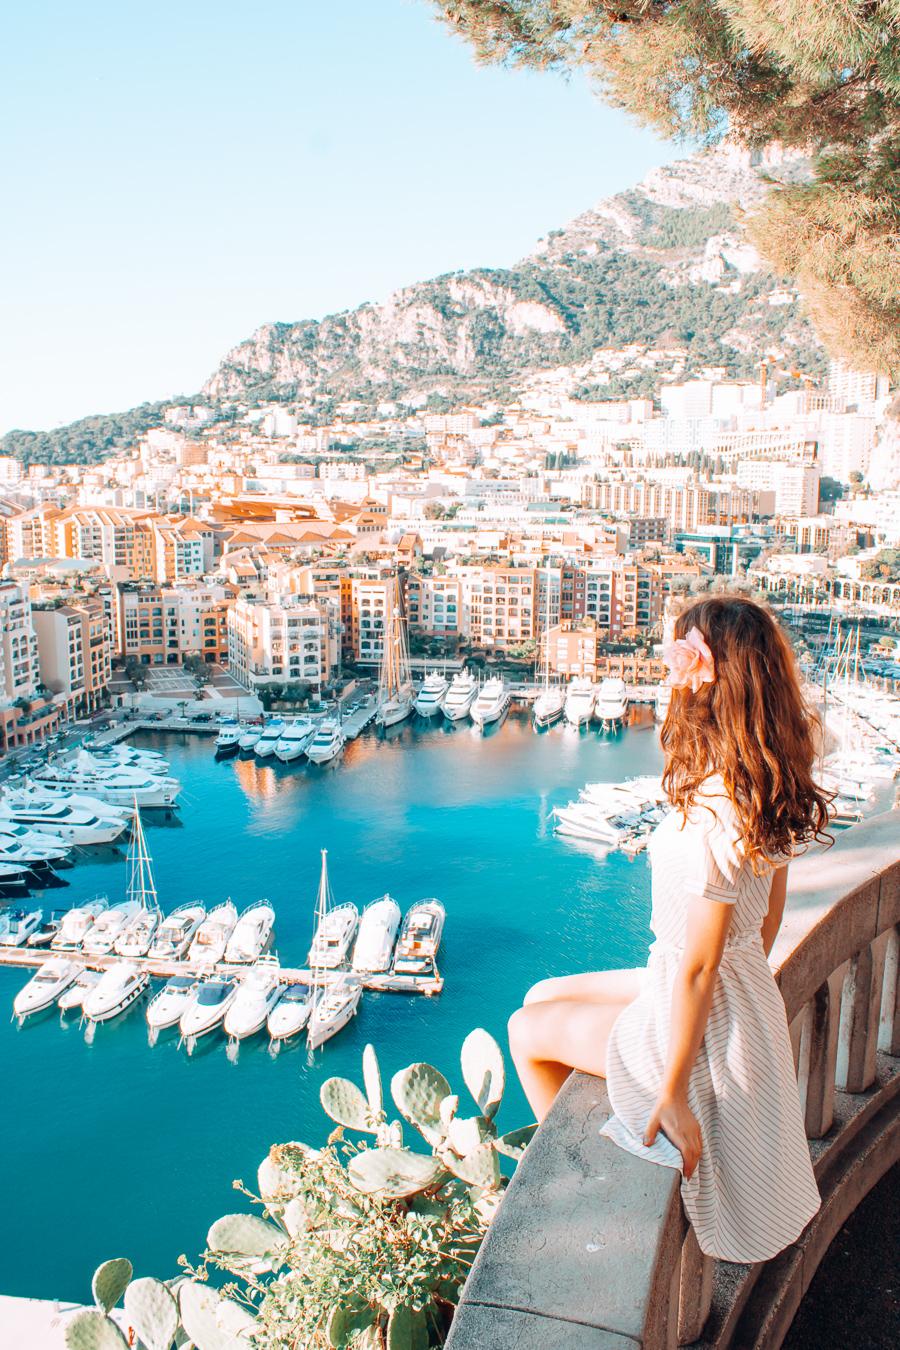 View of Port de Fortvielle in Monaco